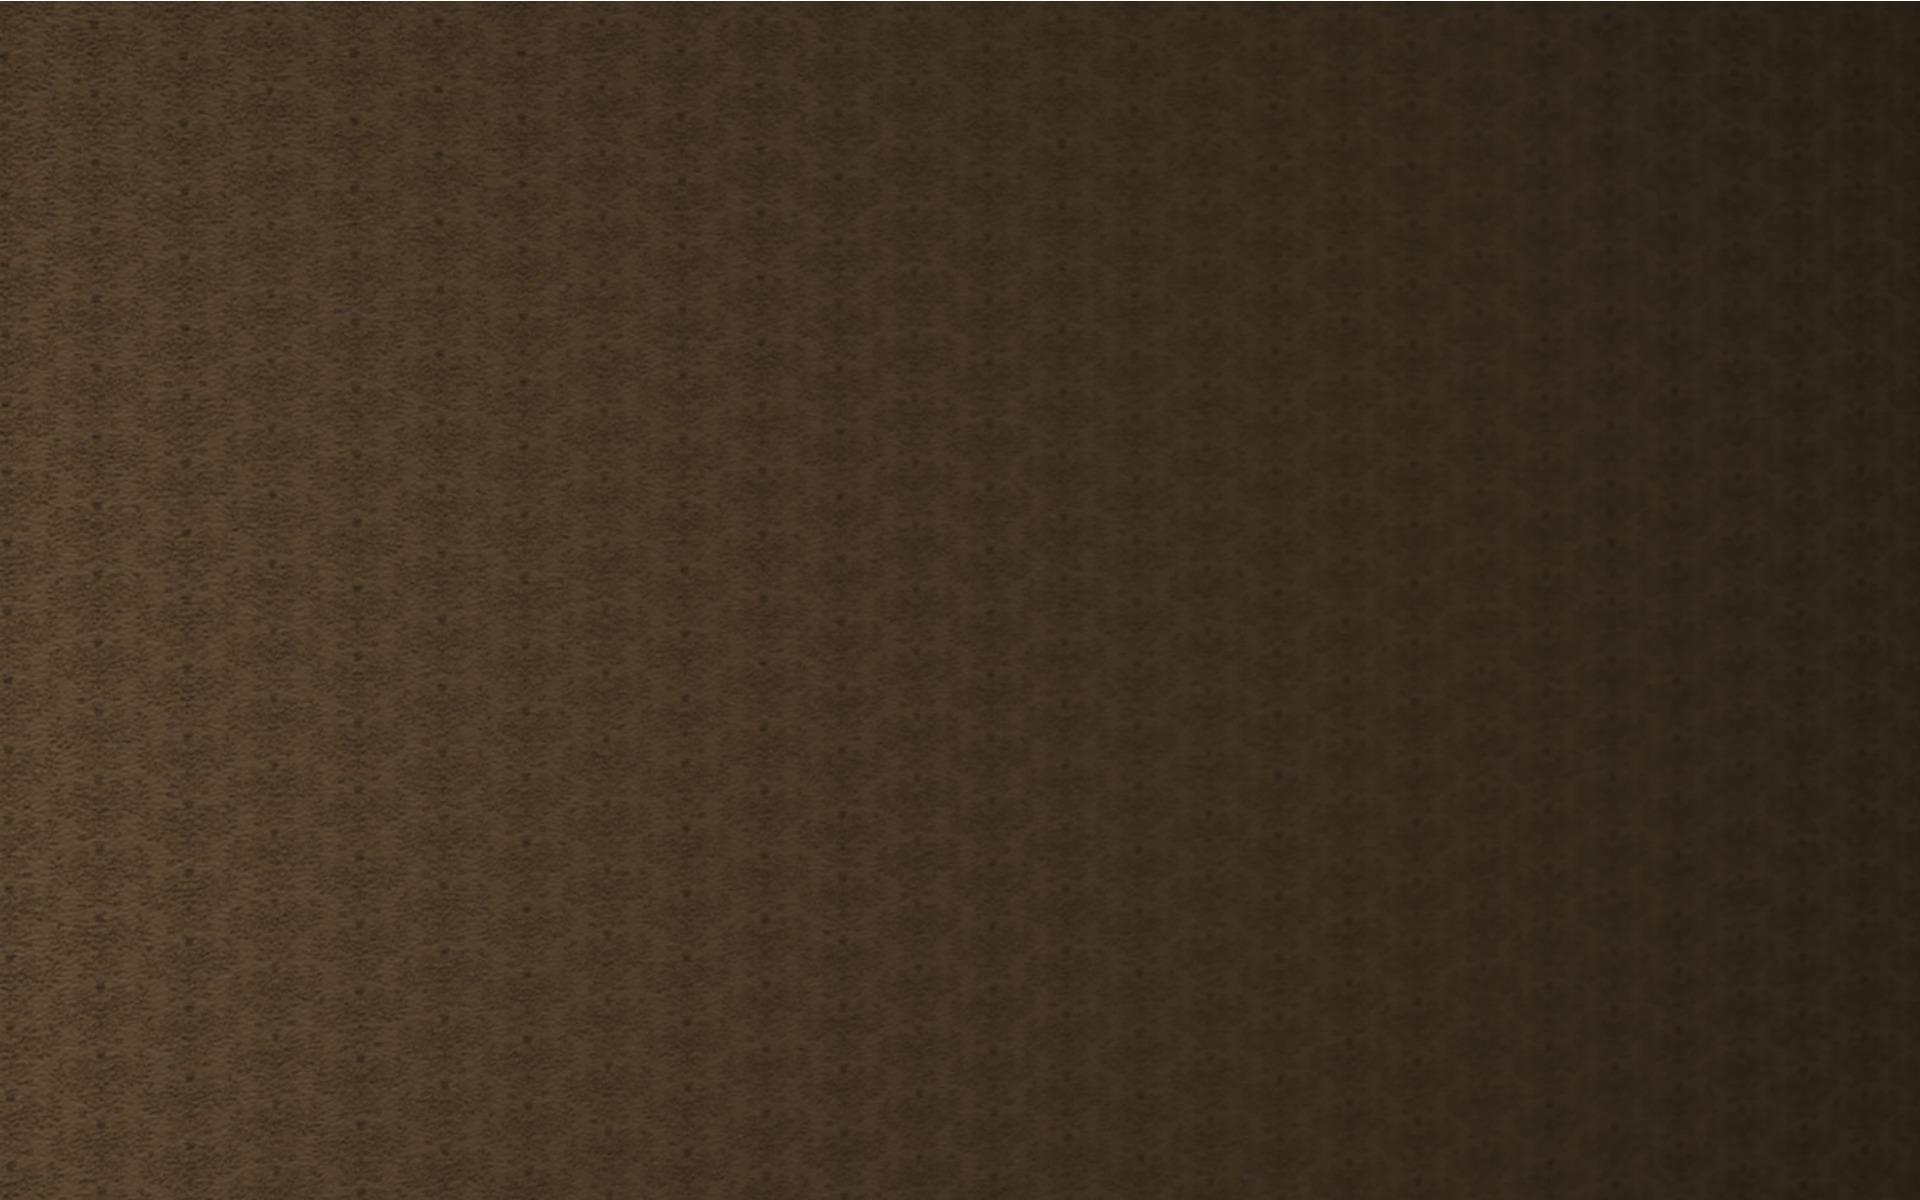 Gucci Pattern Background 1920x1200